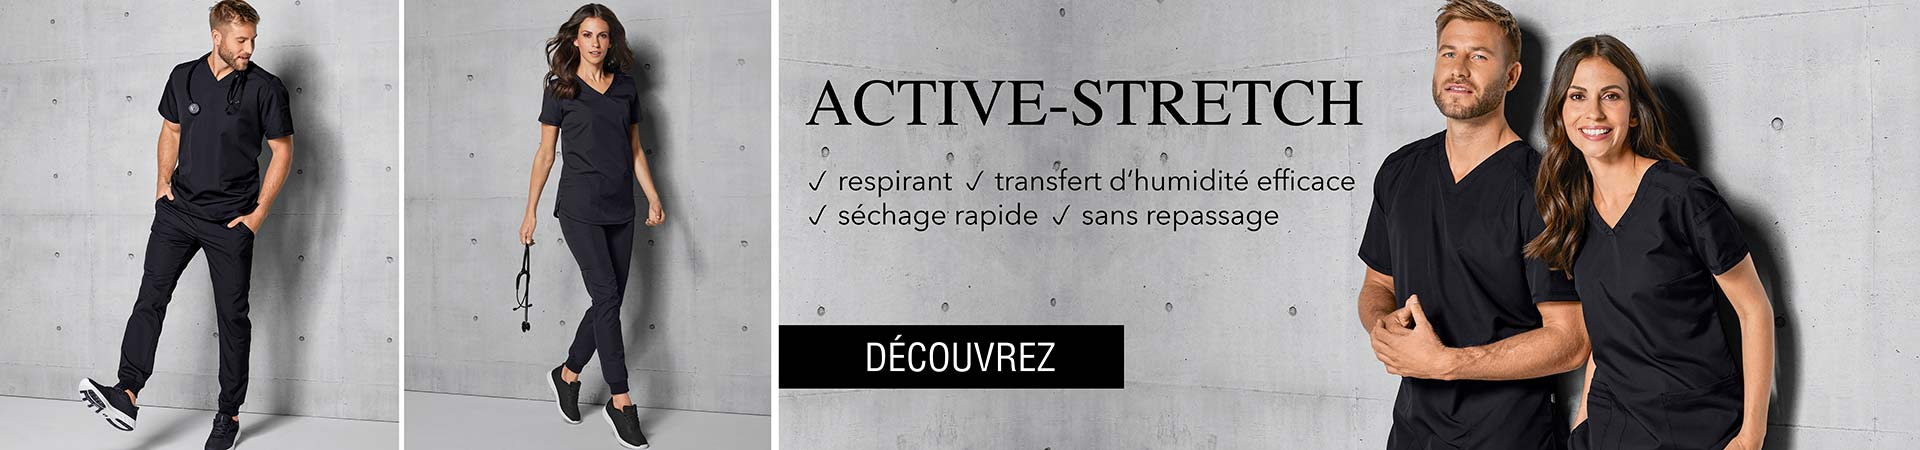 Équipe - Tuniques active-stretch